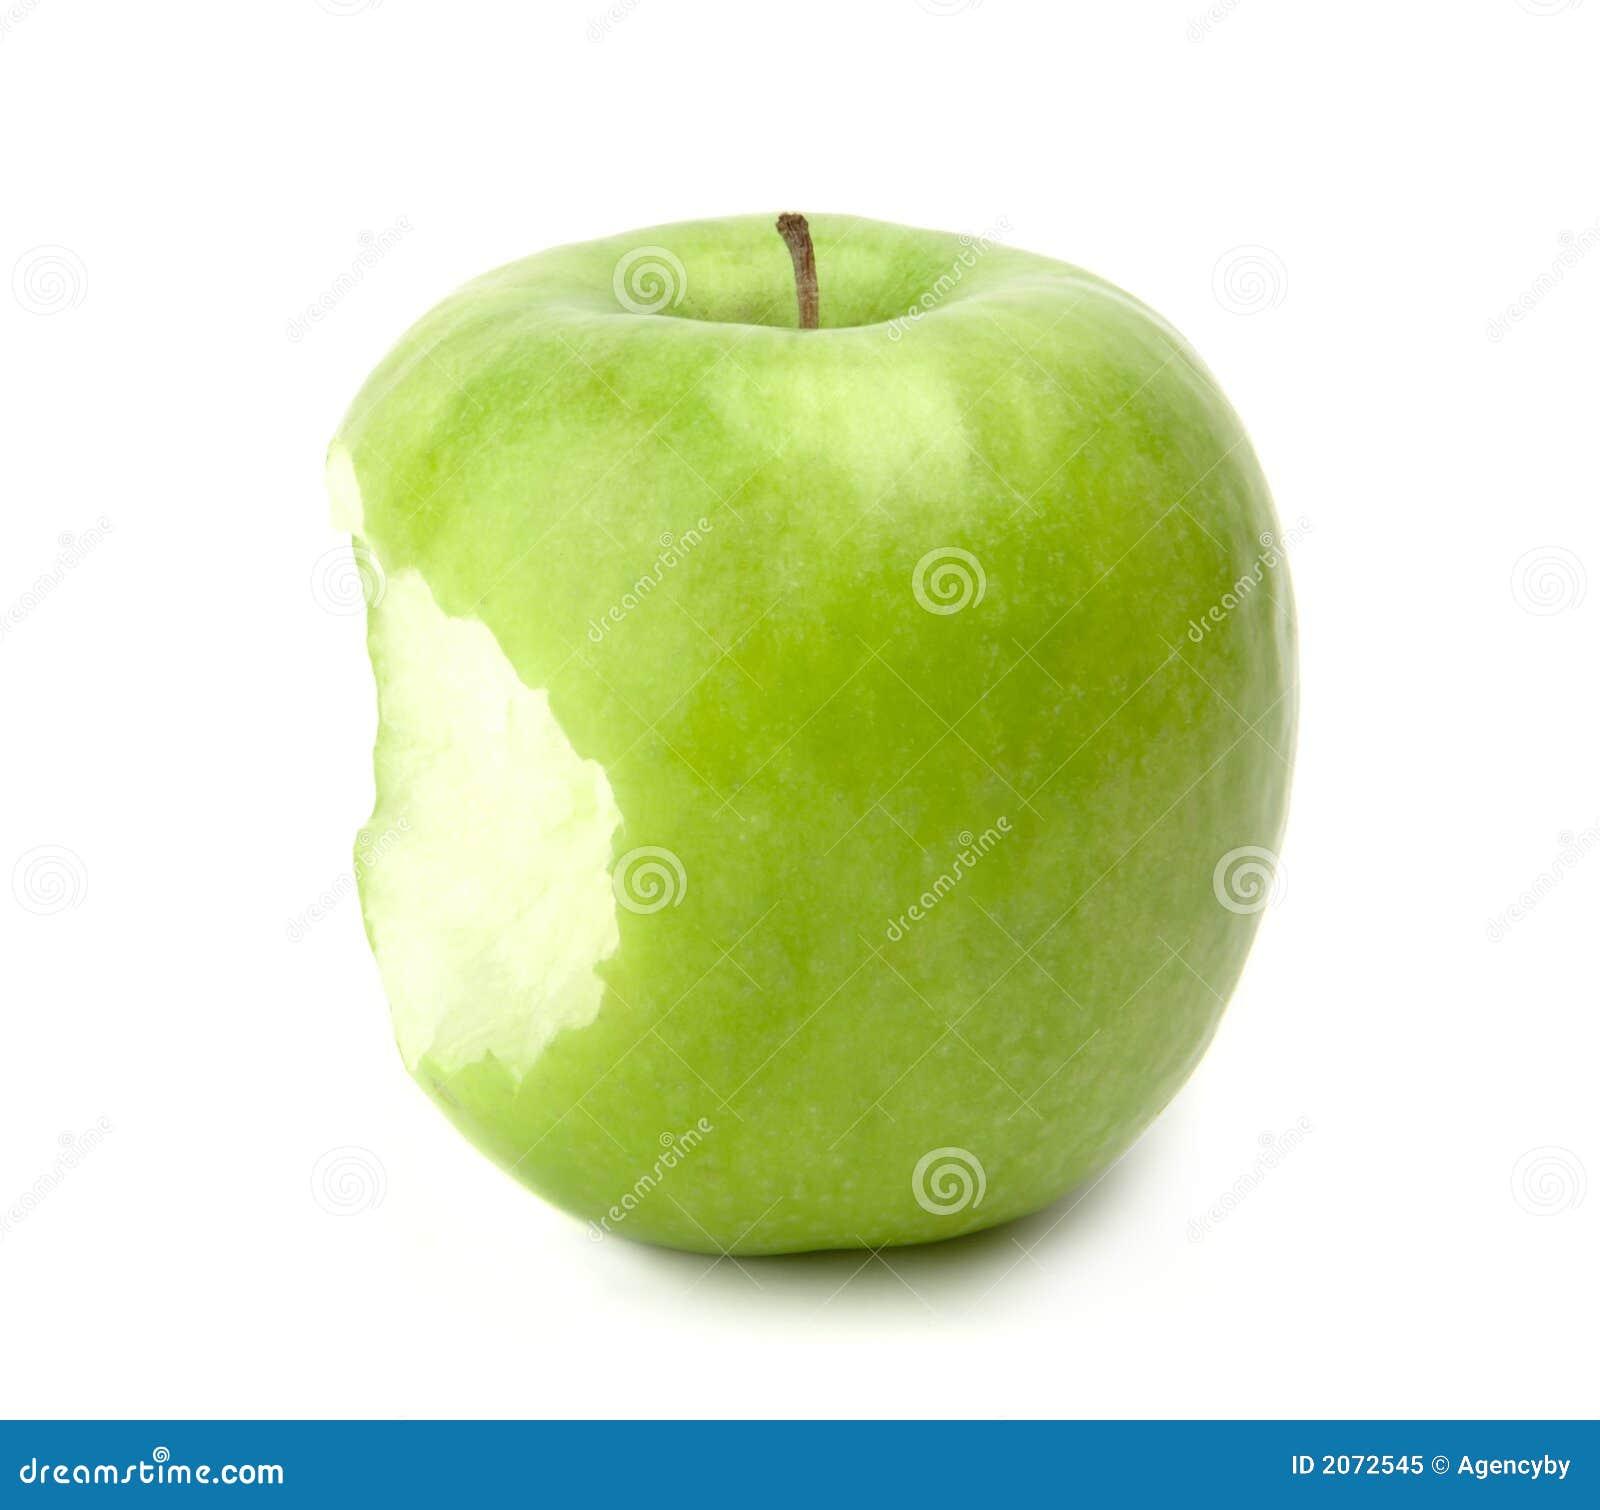 äpple biten green